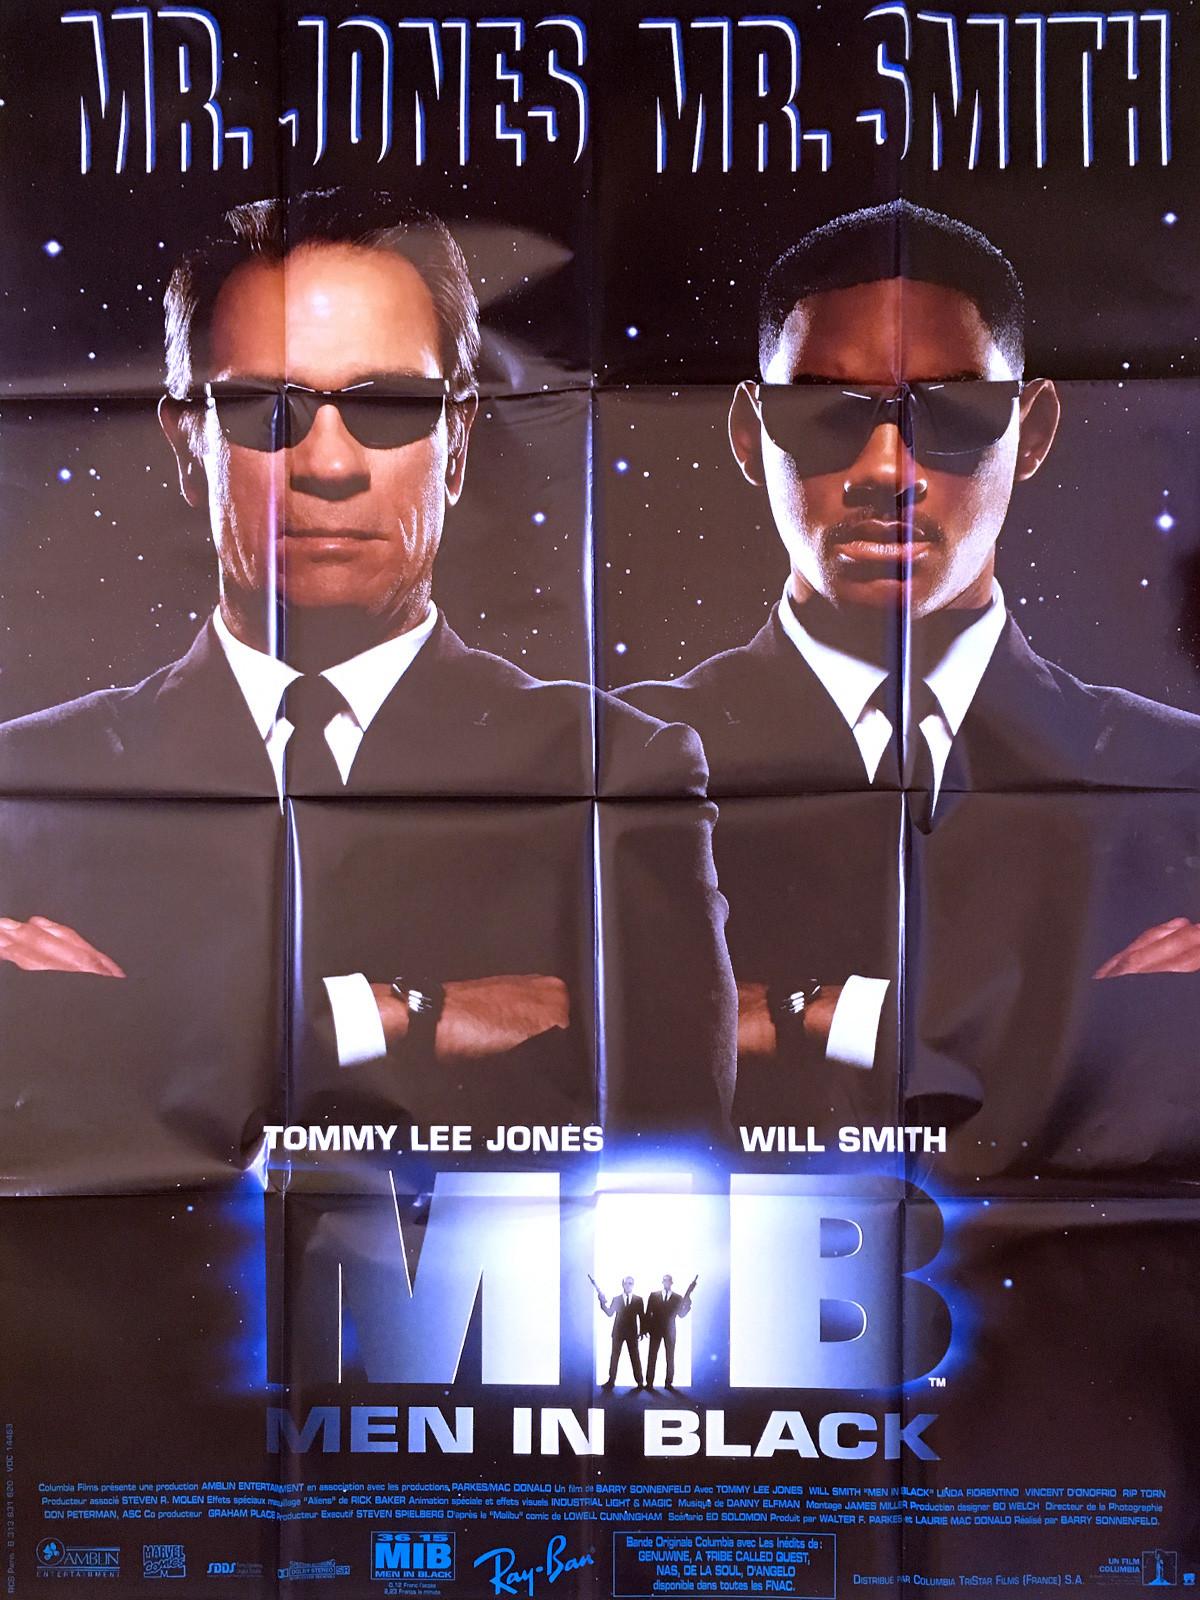 Men In Black Movie Poster 47x63 1997 Will Smith Tommy Lee Jones